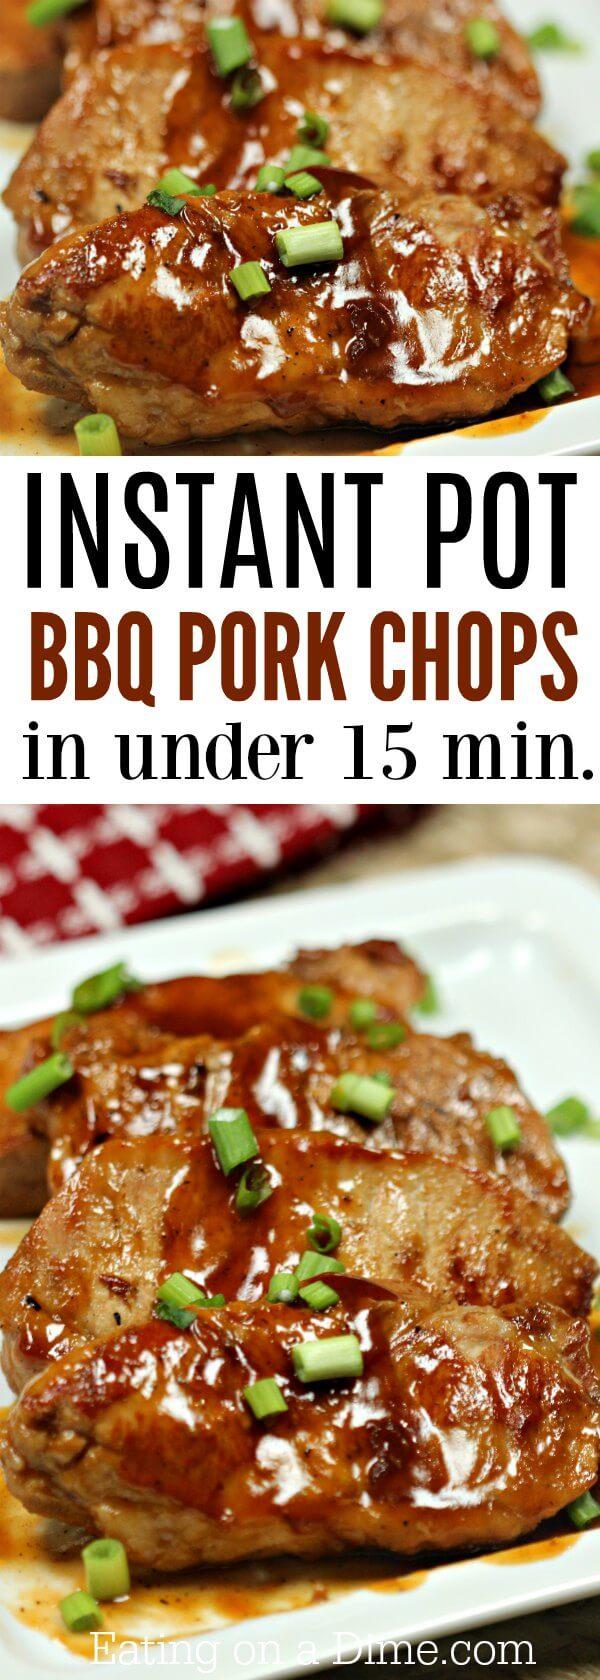 Instant Pot Bbq Pork Chops Recipe Easy Dinner Idea